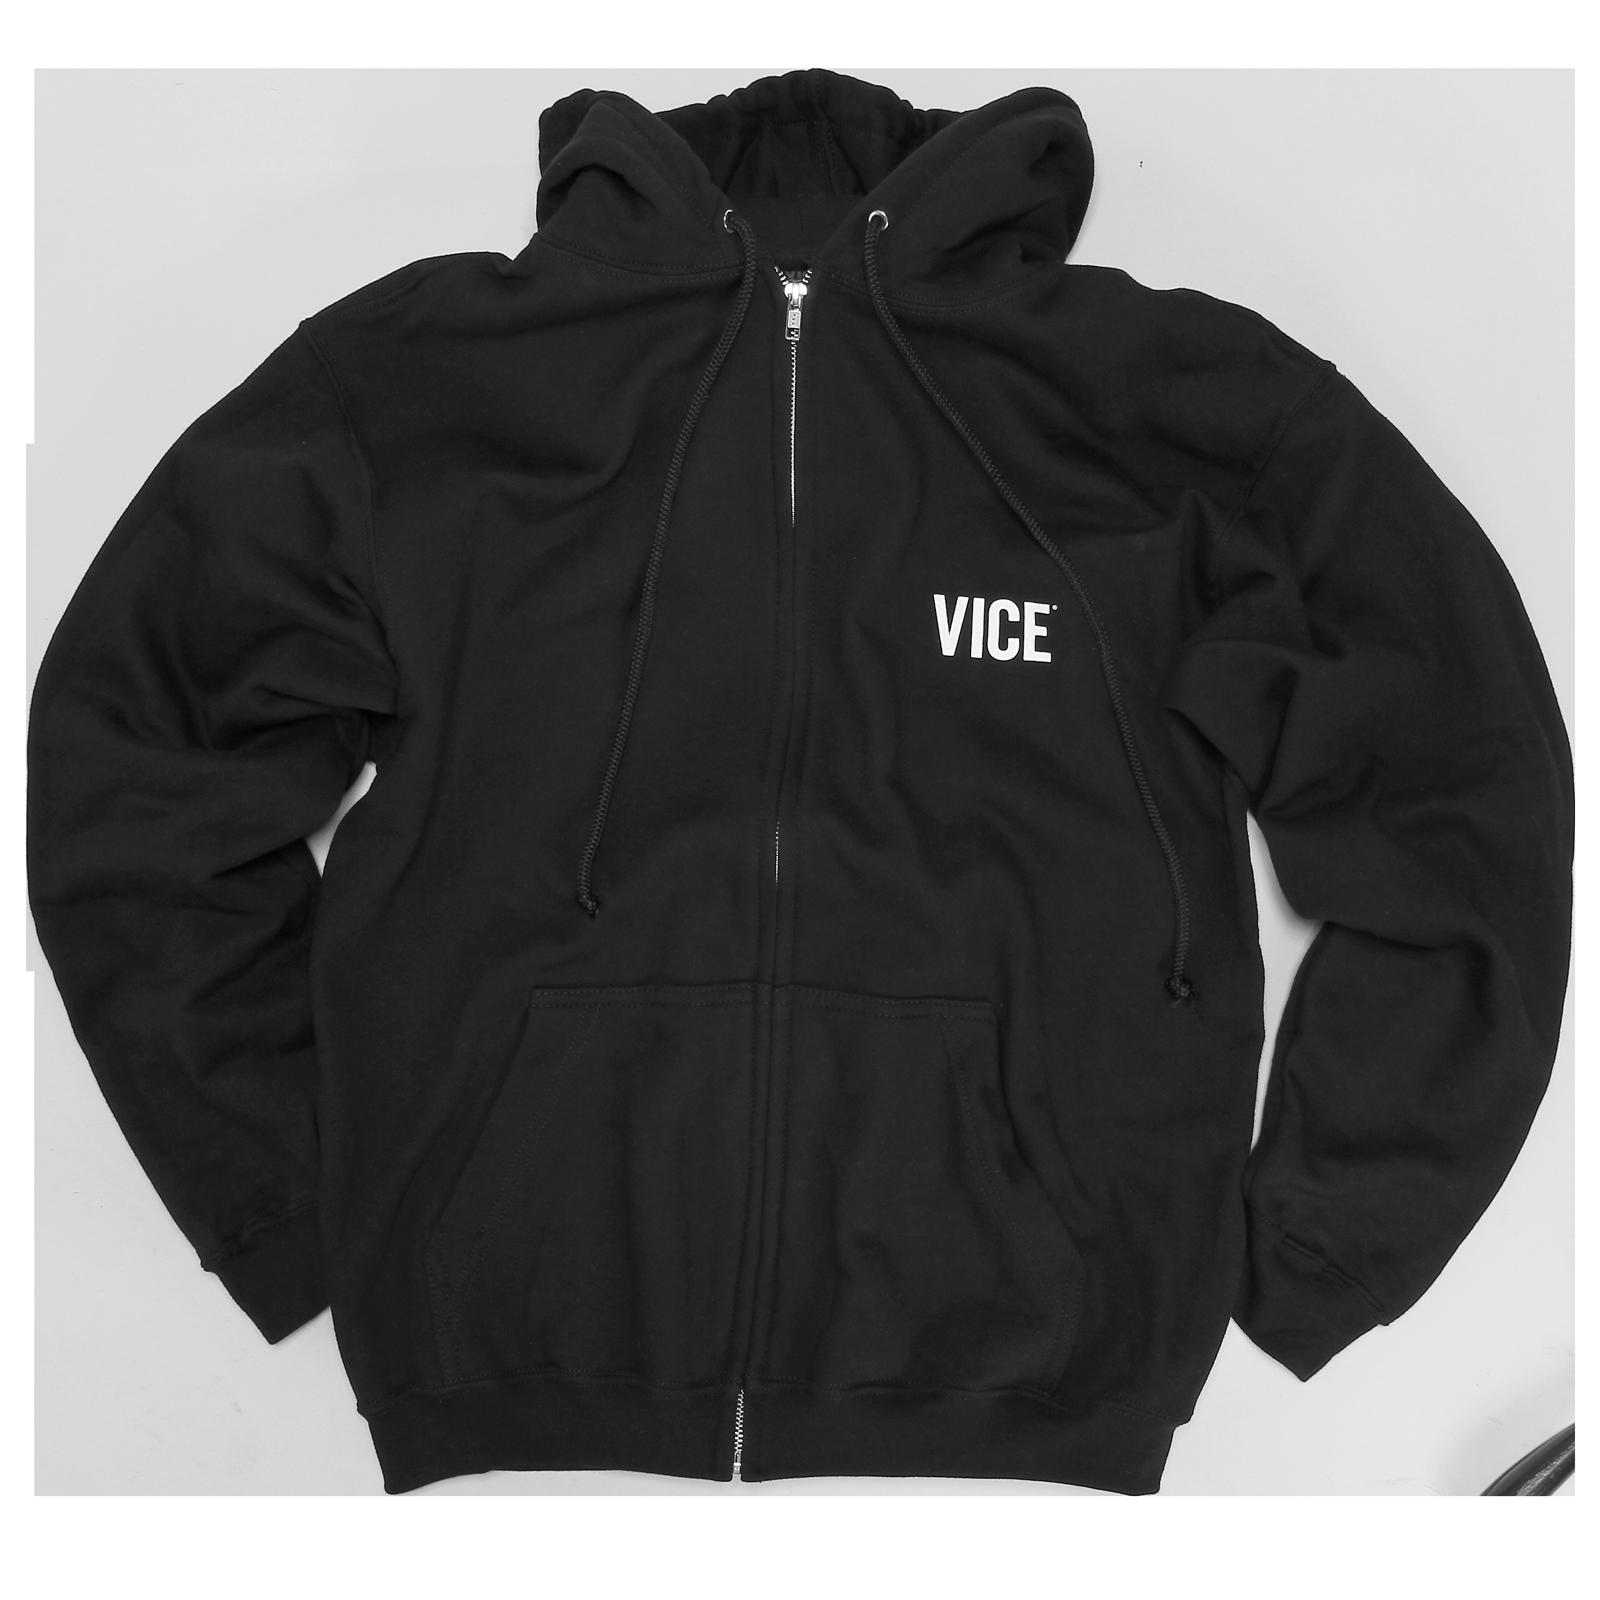 VICE Black Zipper Hoodie